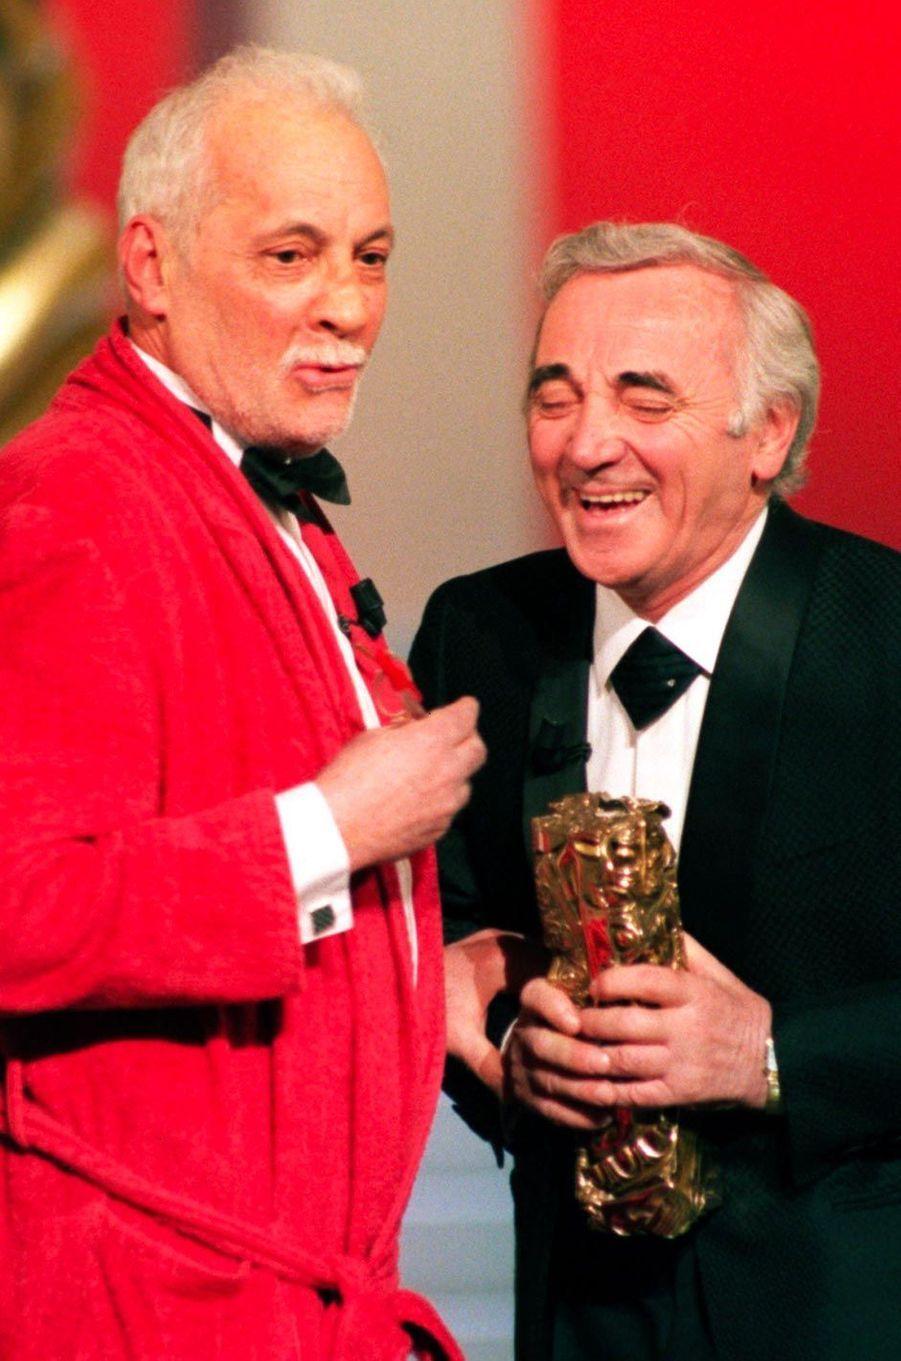 Michel Serrault et Charles Aznavour, en février 1997.